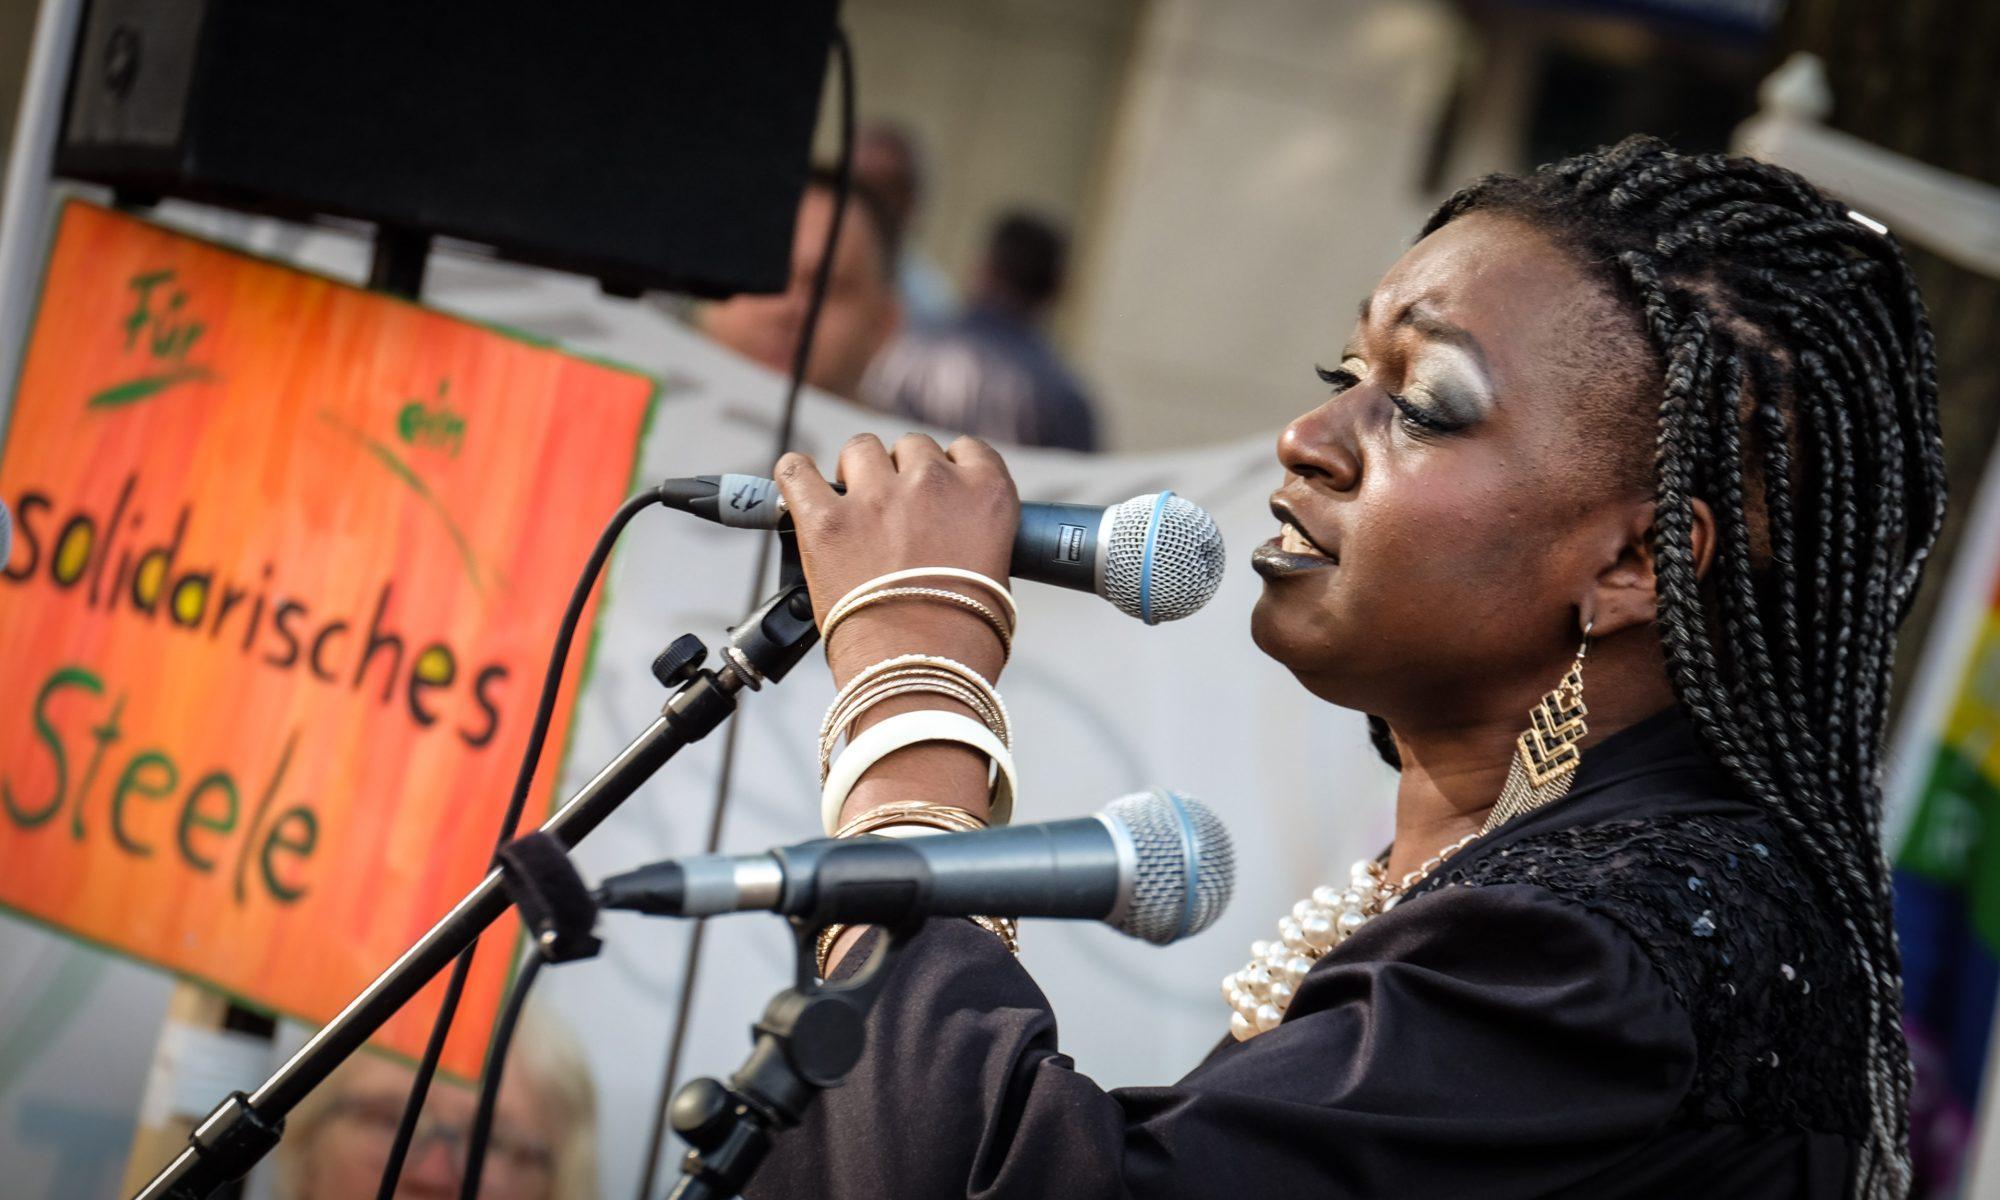 Achan Malonda in Steele Juli 2019